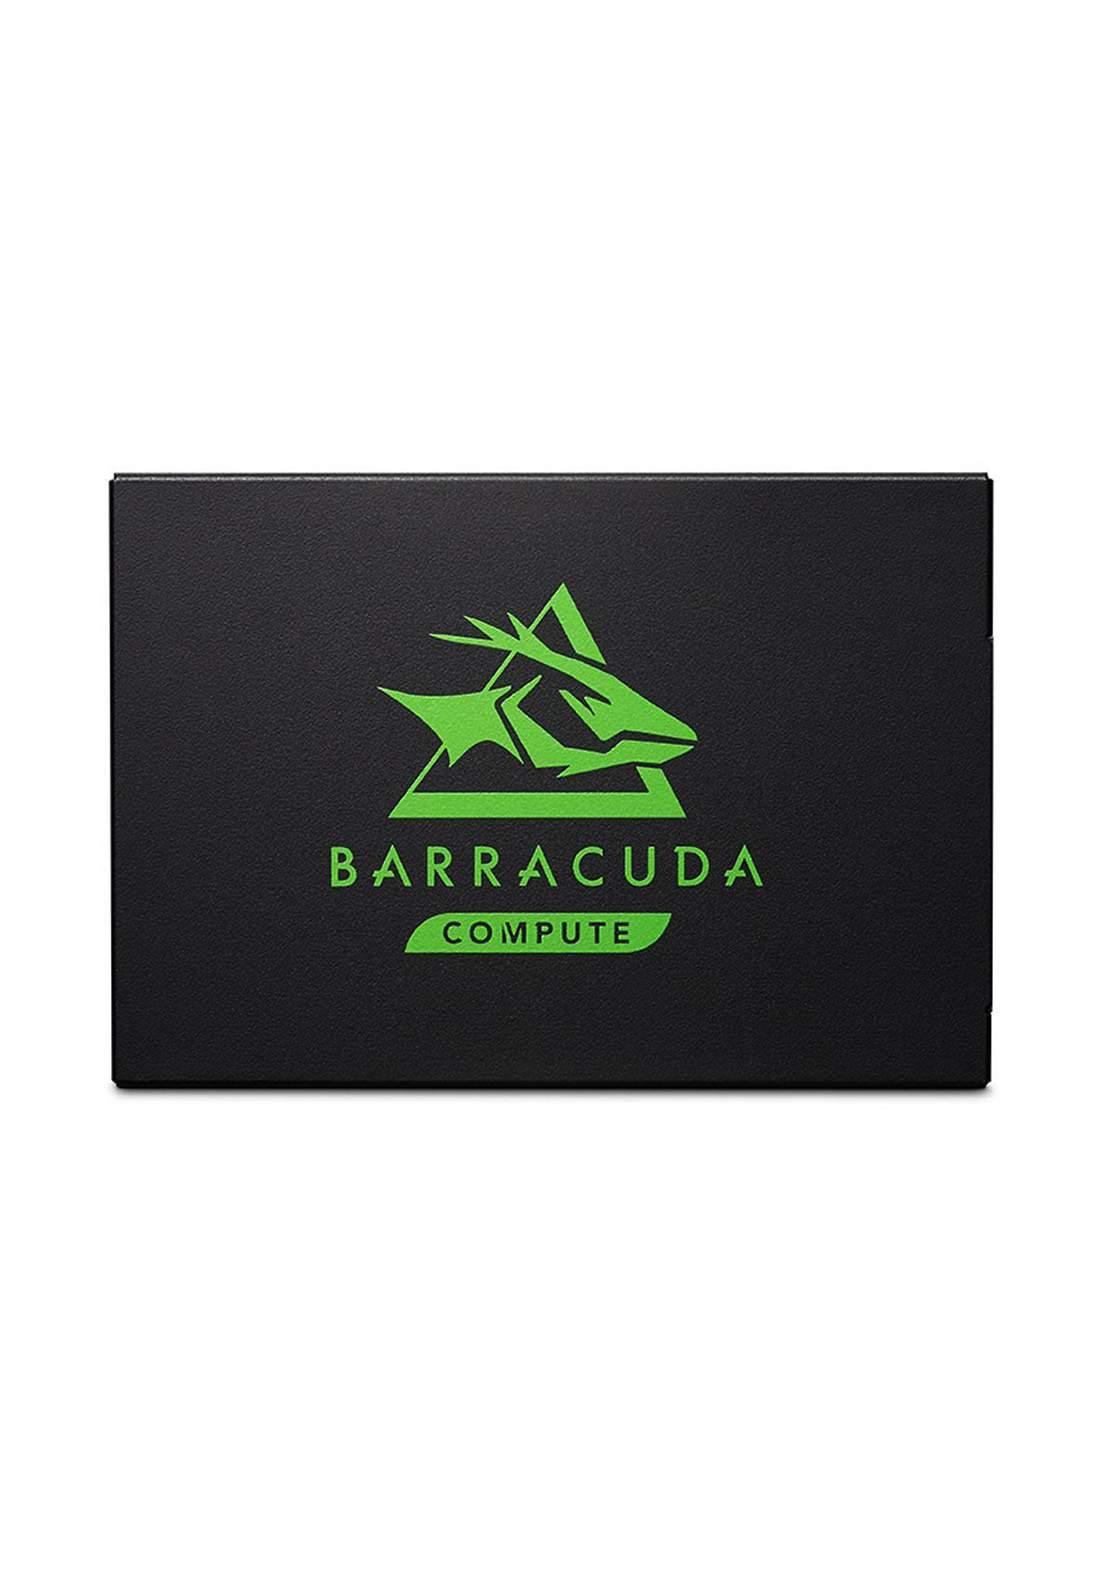 Seagate1TB Barracuda 2.5 inch  3D Tlc Internal Solid State Drive هارد داخلي